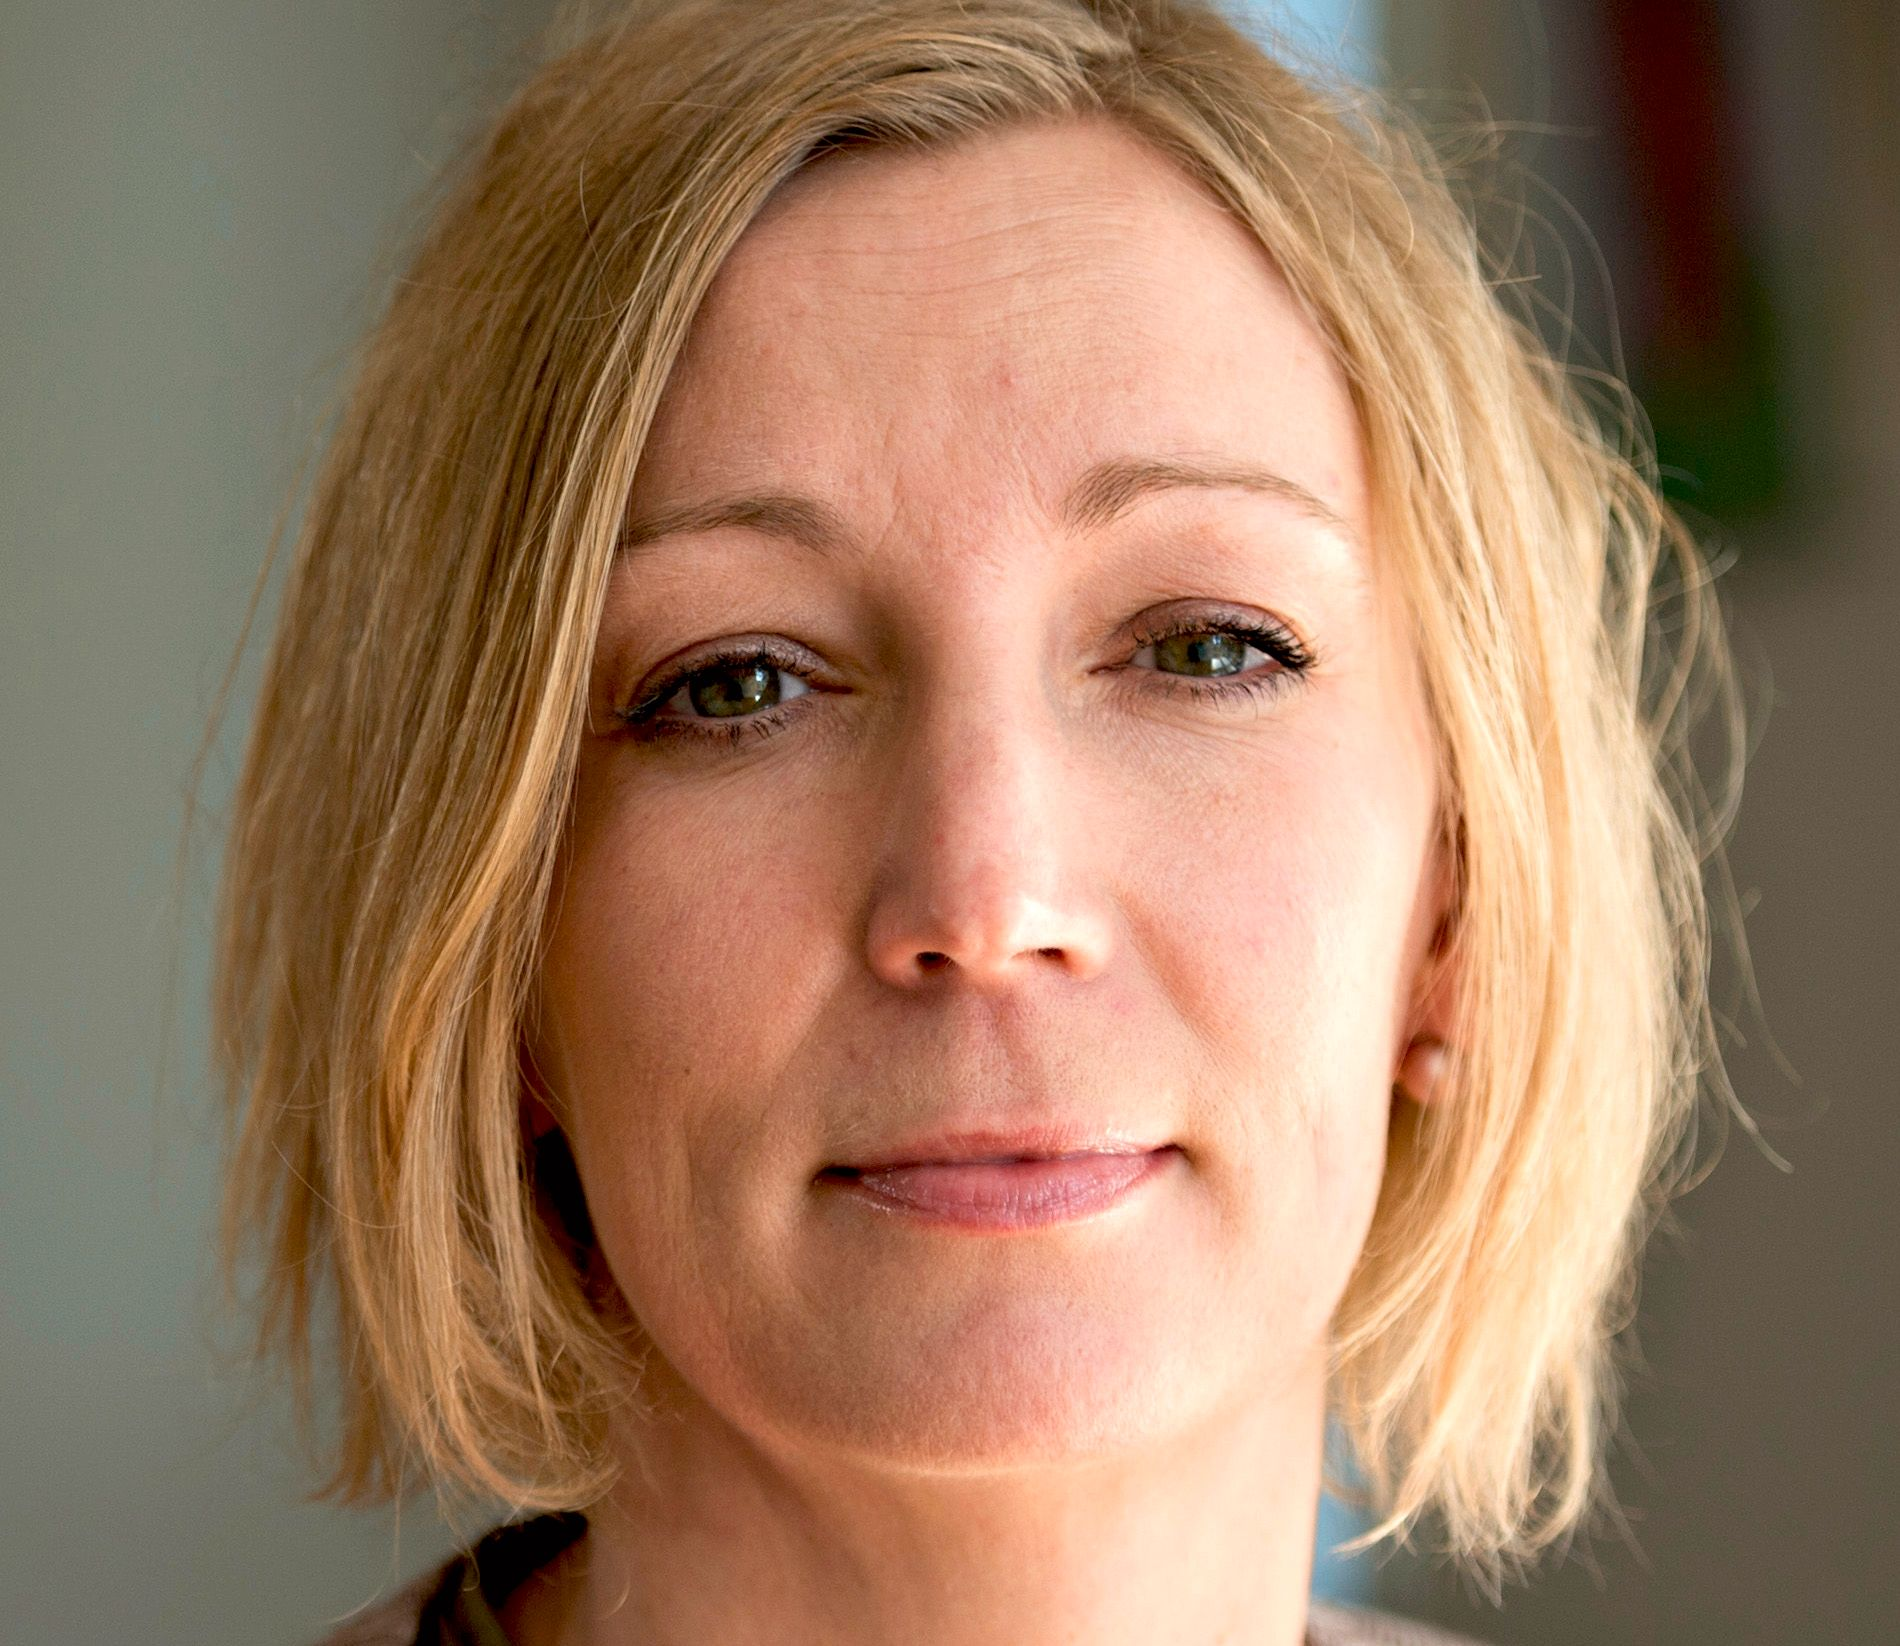 Linda Susanne Krüger